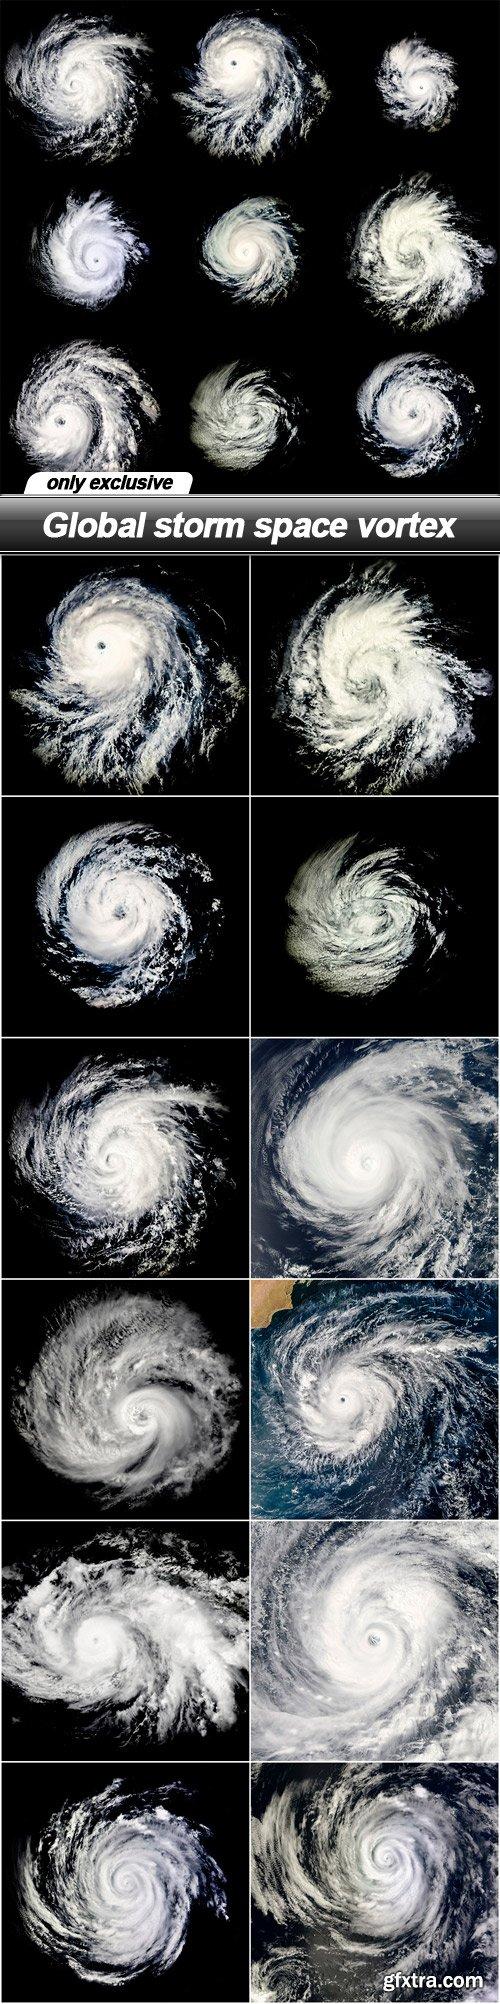 Global storm space vortex - 13 UHQ JPEG